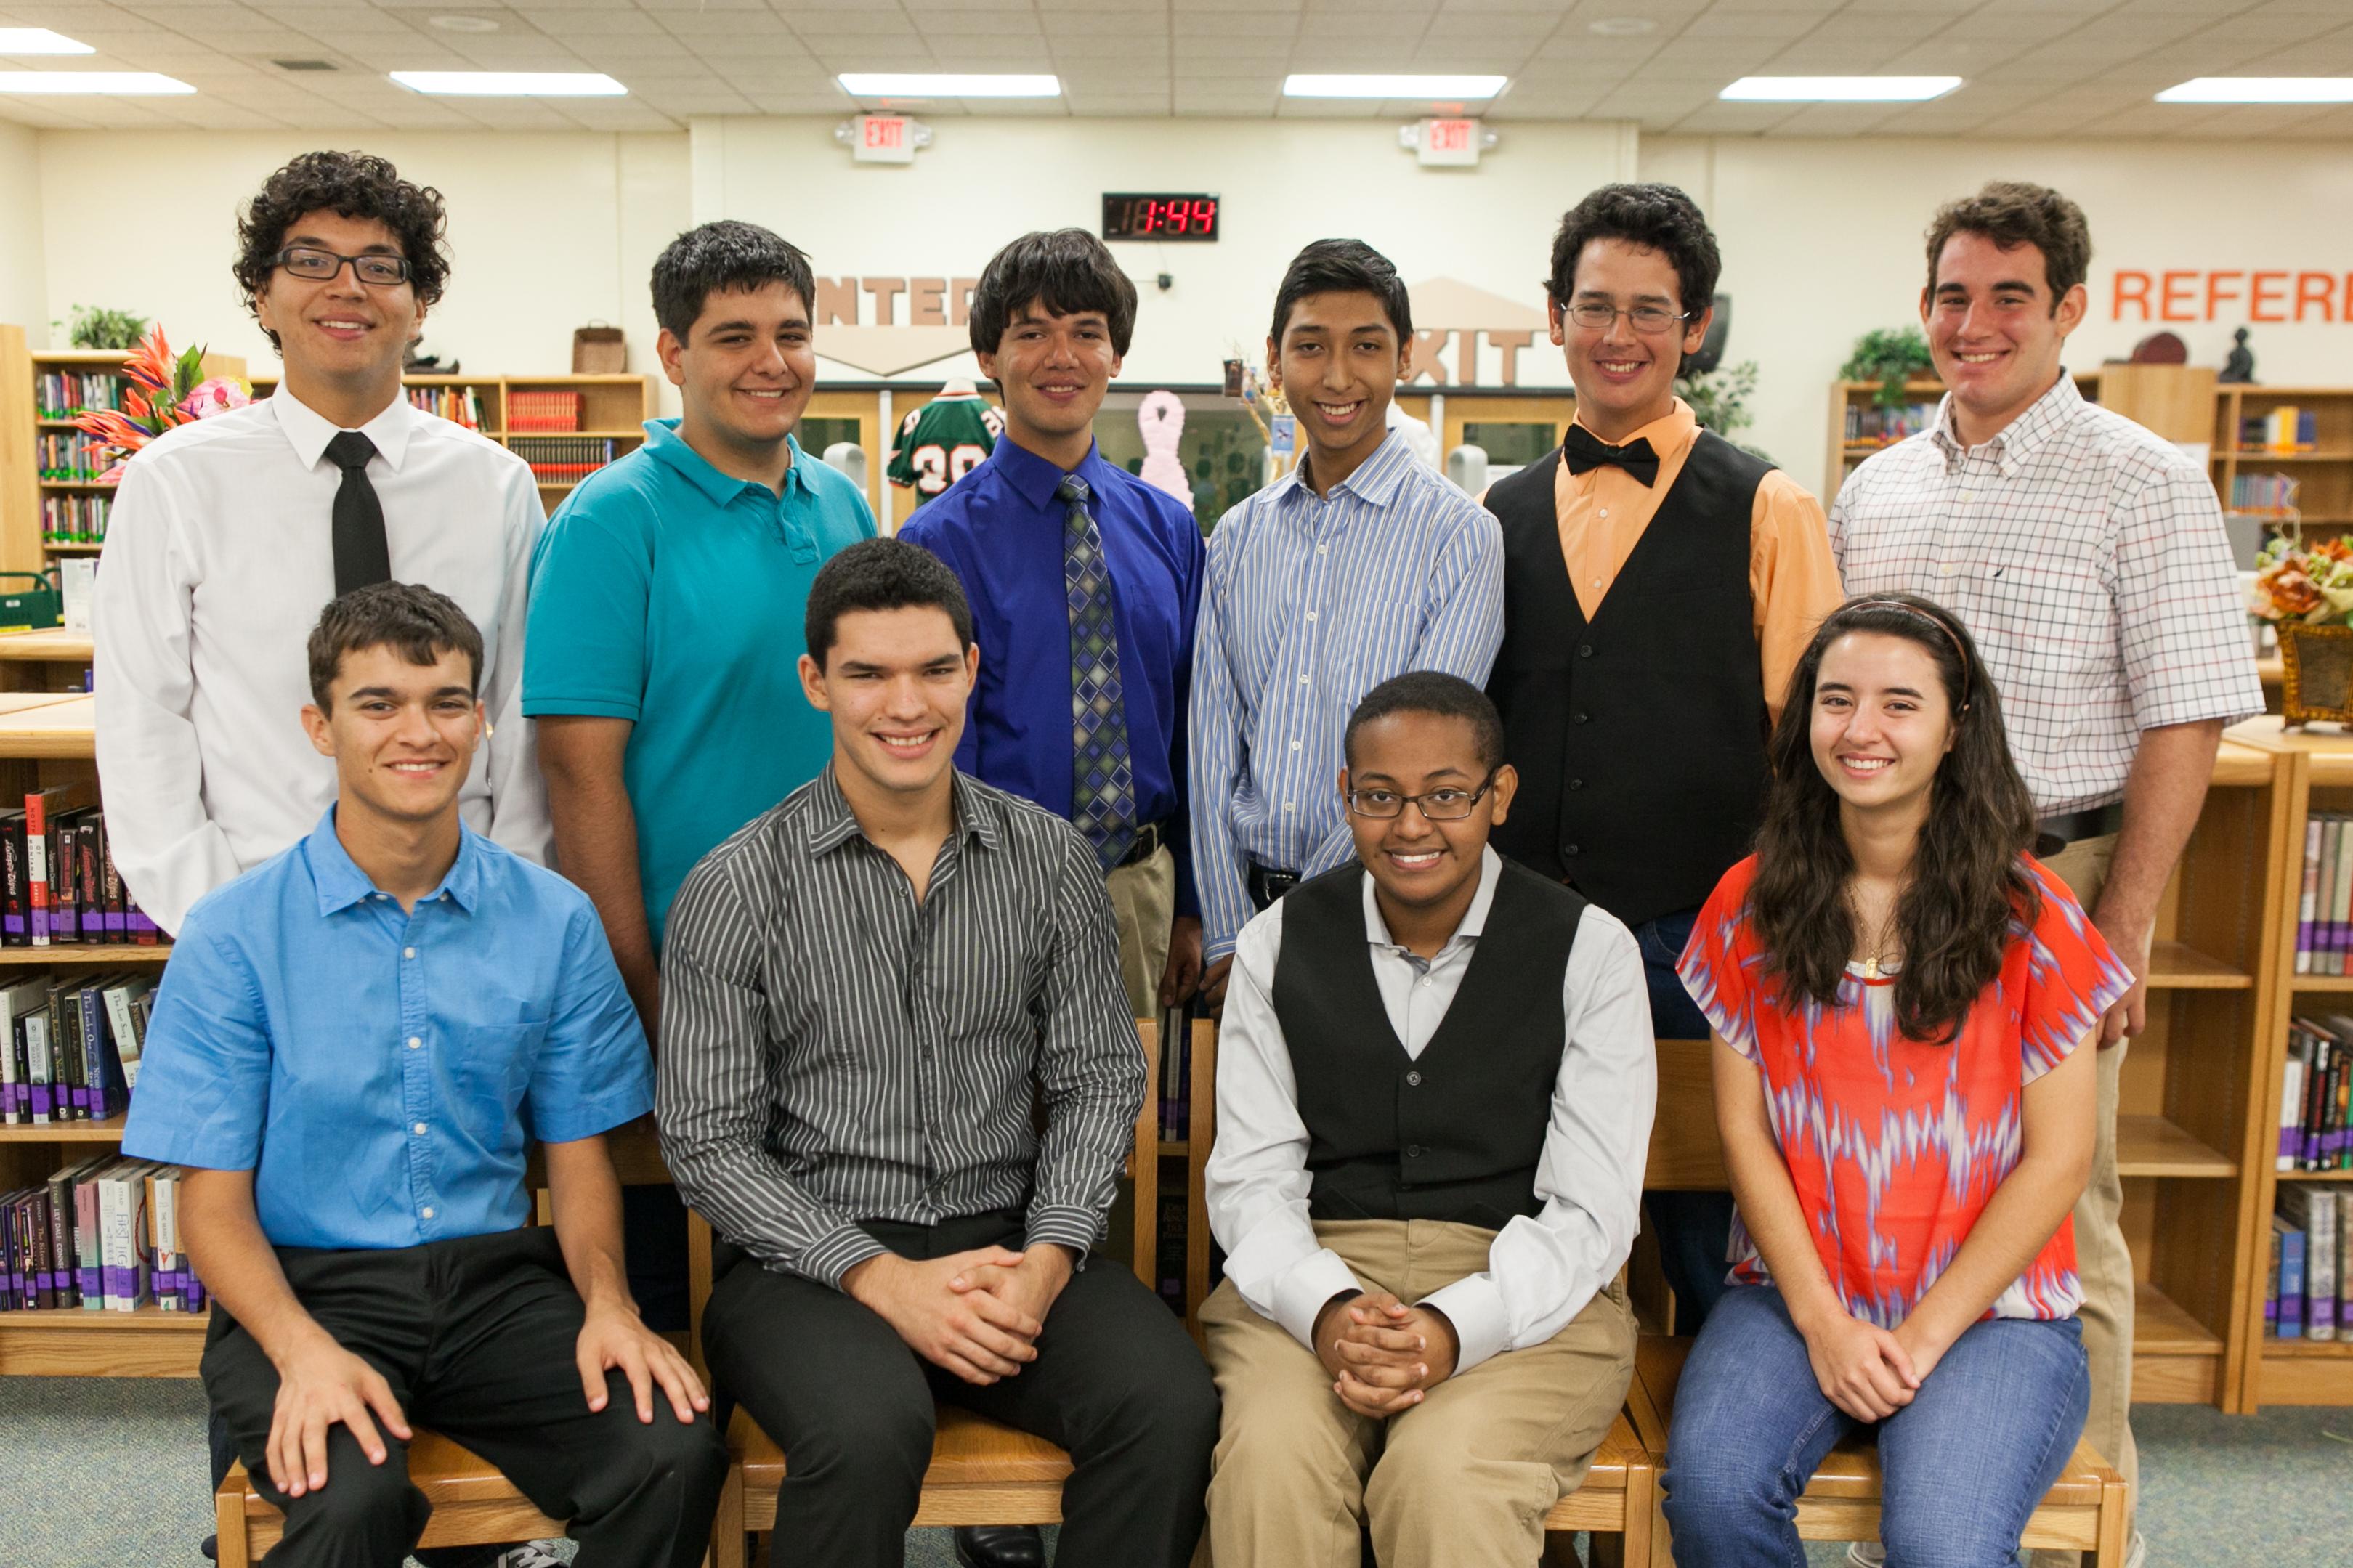 HHSS seniors make campus history with selection to prestigious program